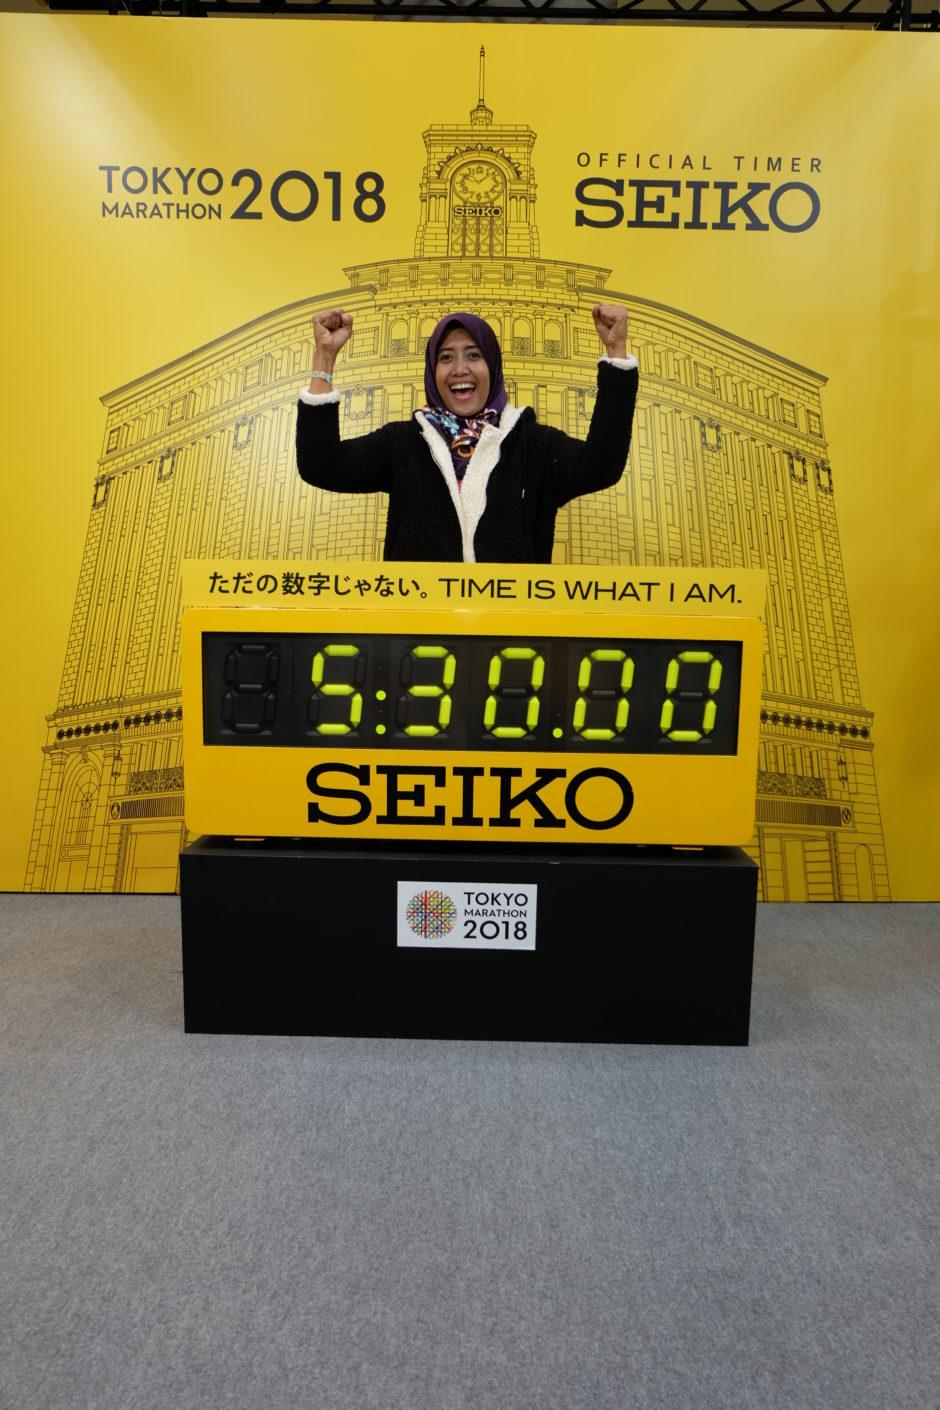 Tokyo Marathon 2018 Berlari dengan Bahagia, Tokyo Marathon 2018 Berlari dengan Bahagia, Jurnal Suzannita